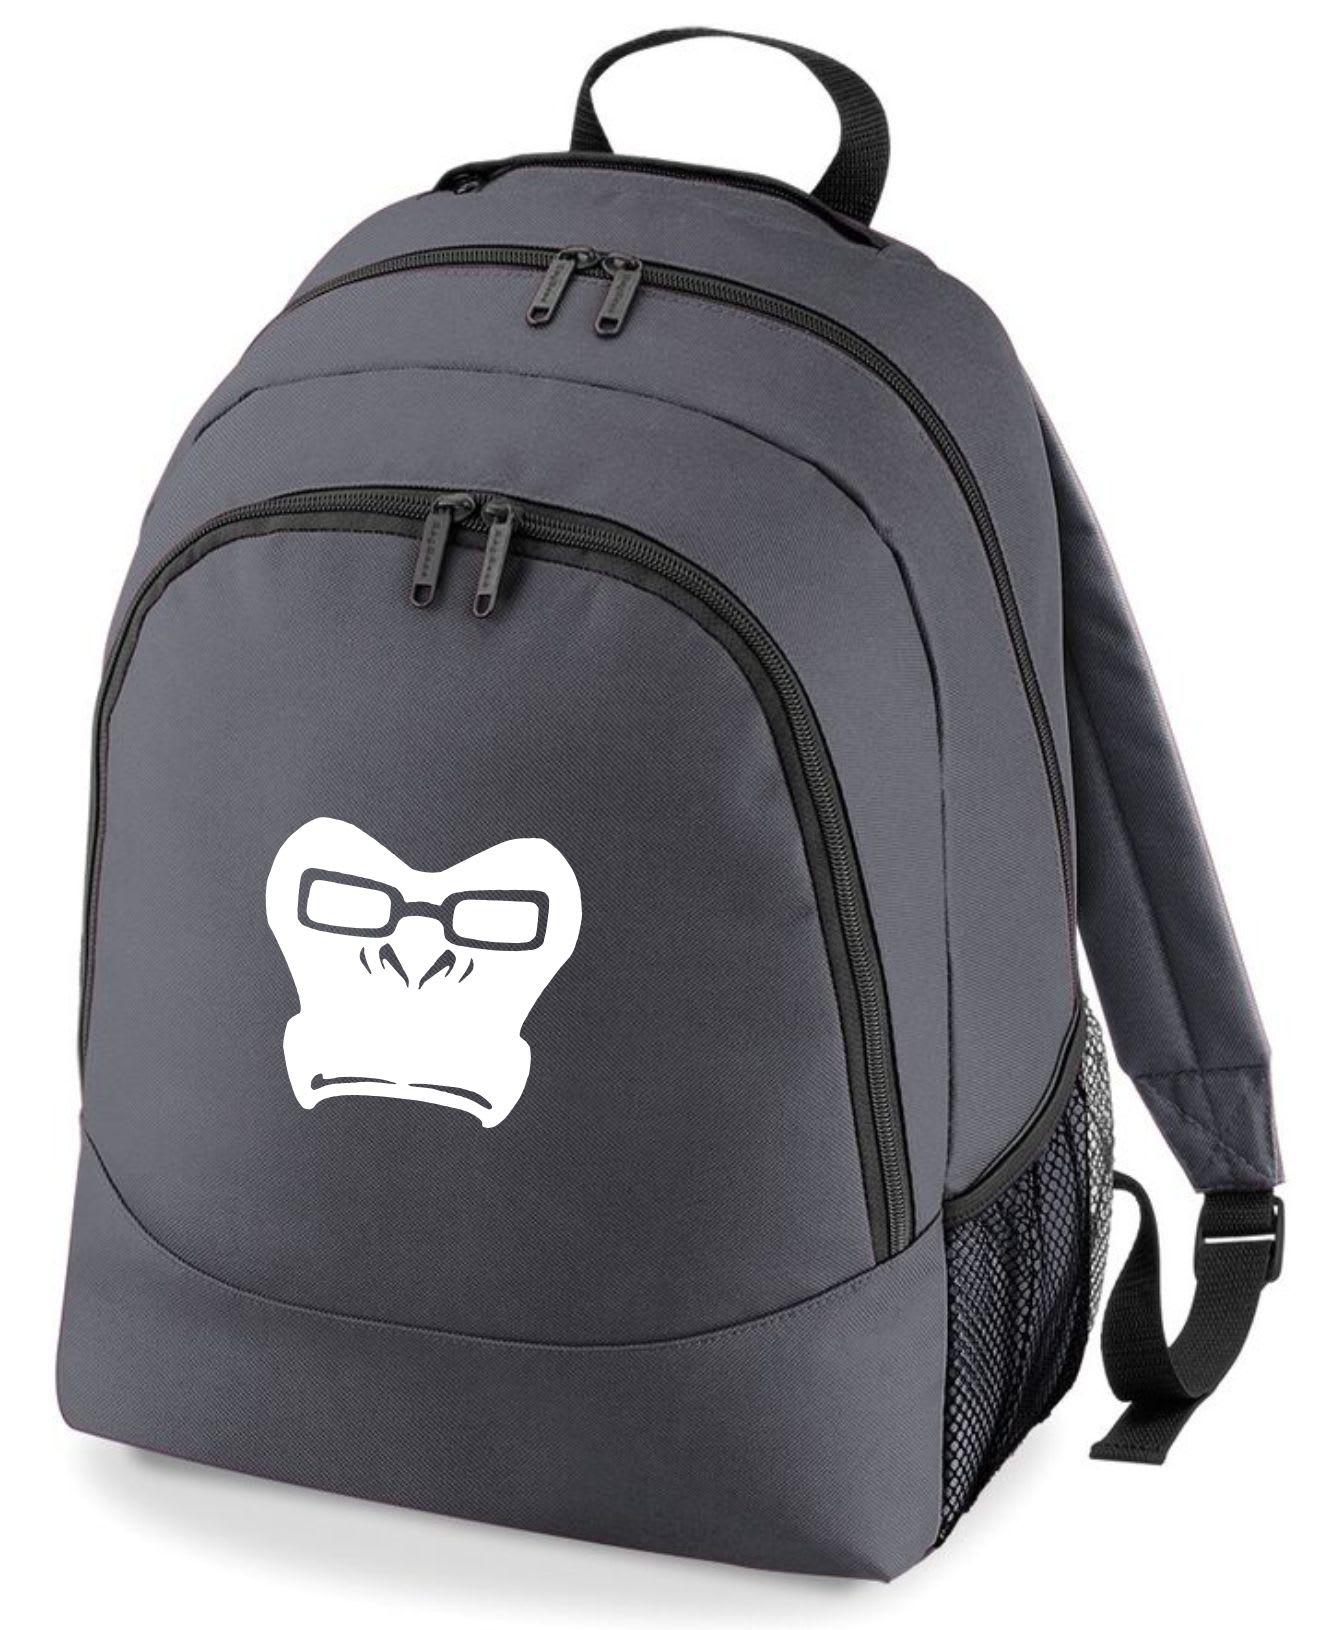 Overwatch Rucksack Bag Winston